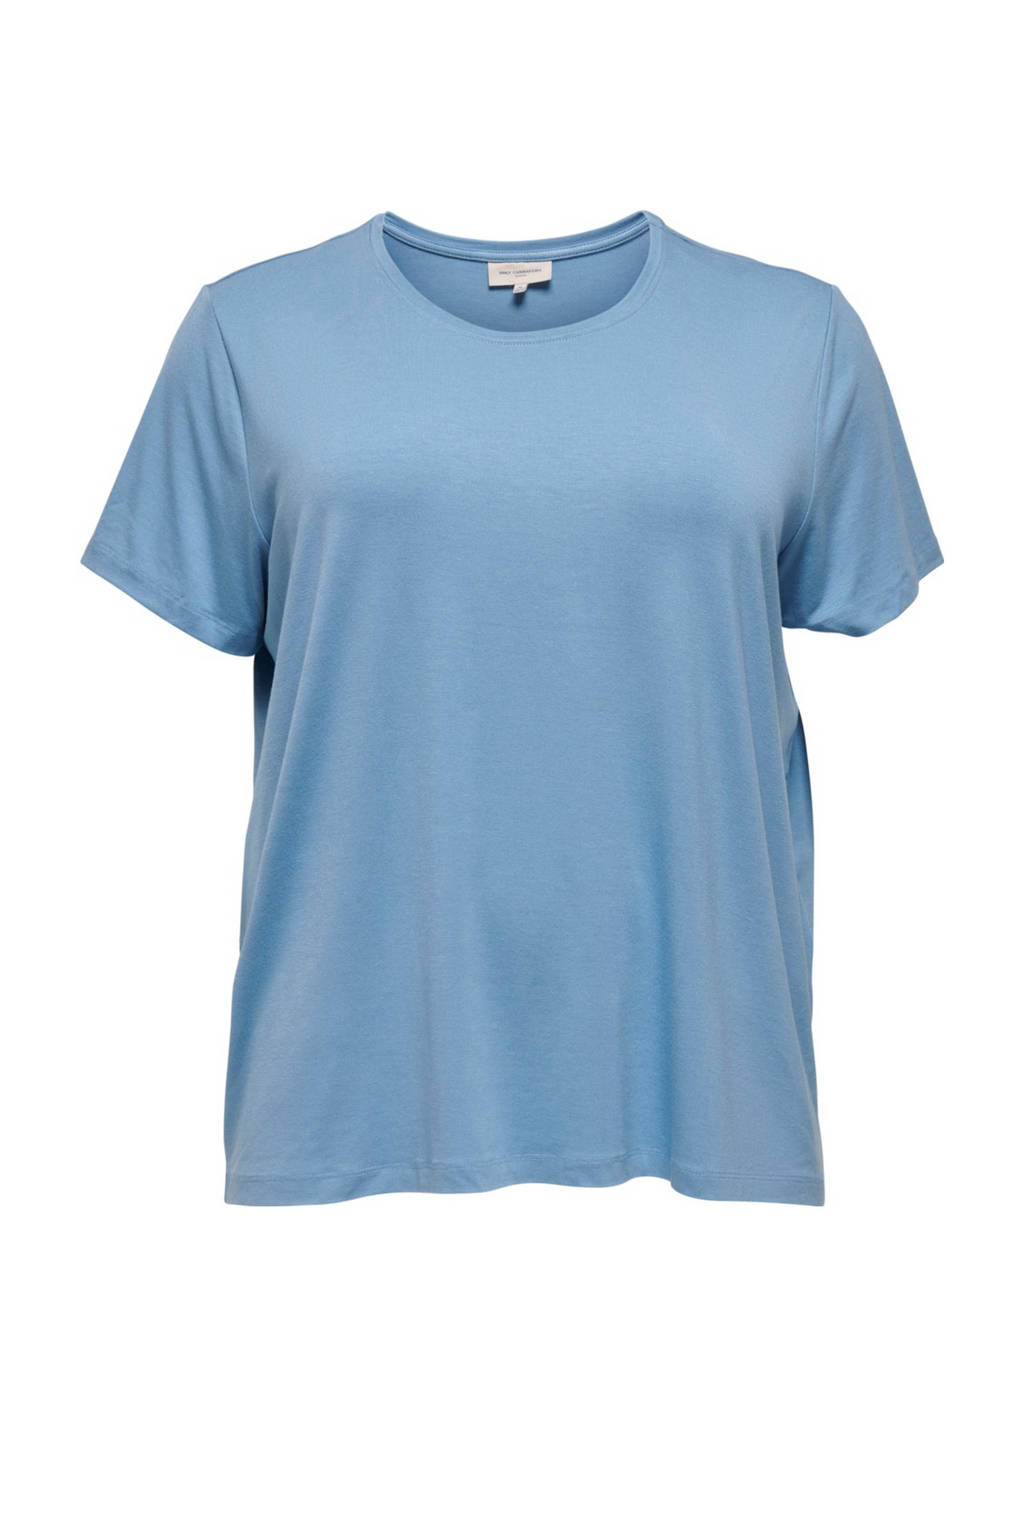 ONLY CARMAKOMA T-shirt lichtblauw, Lichtblauw